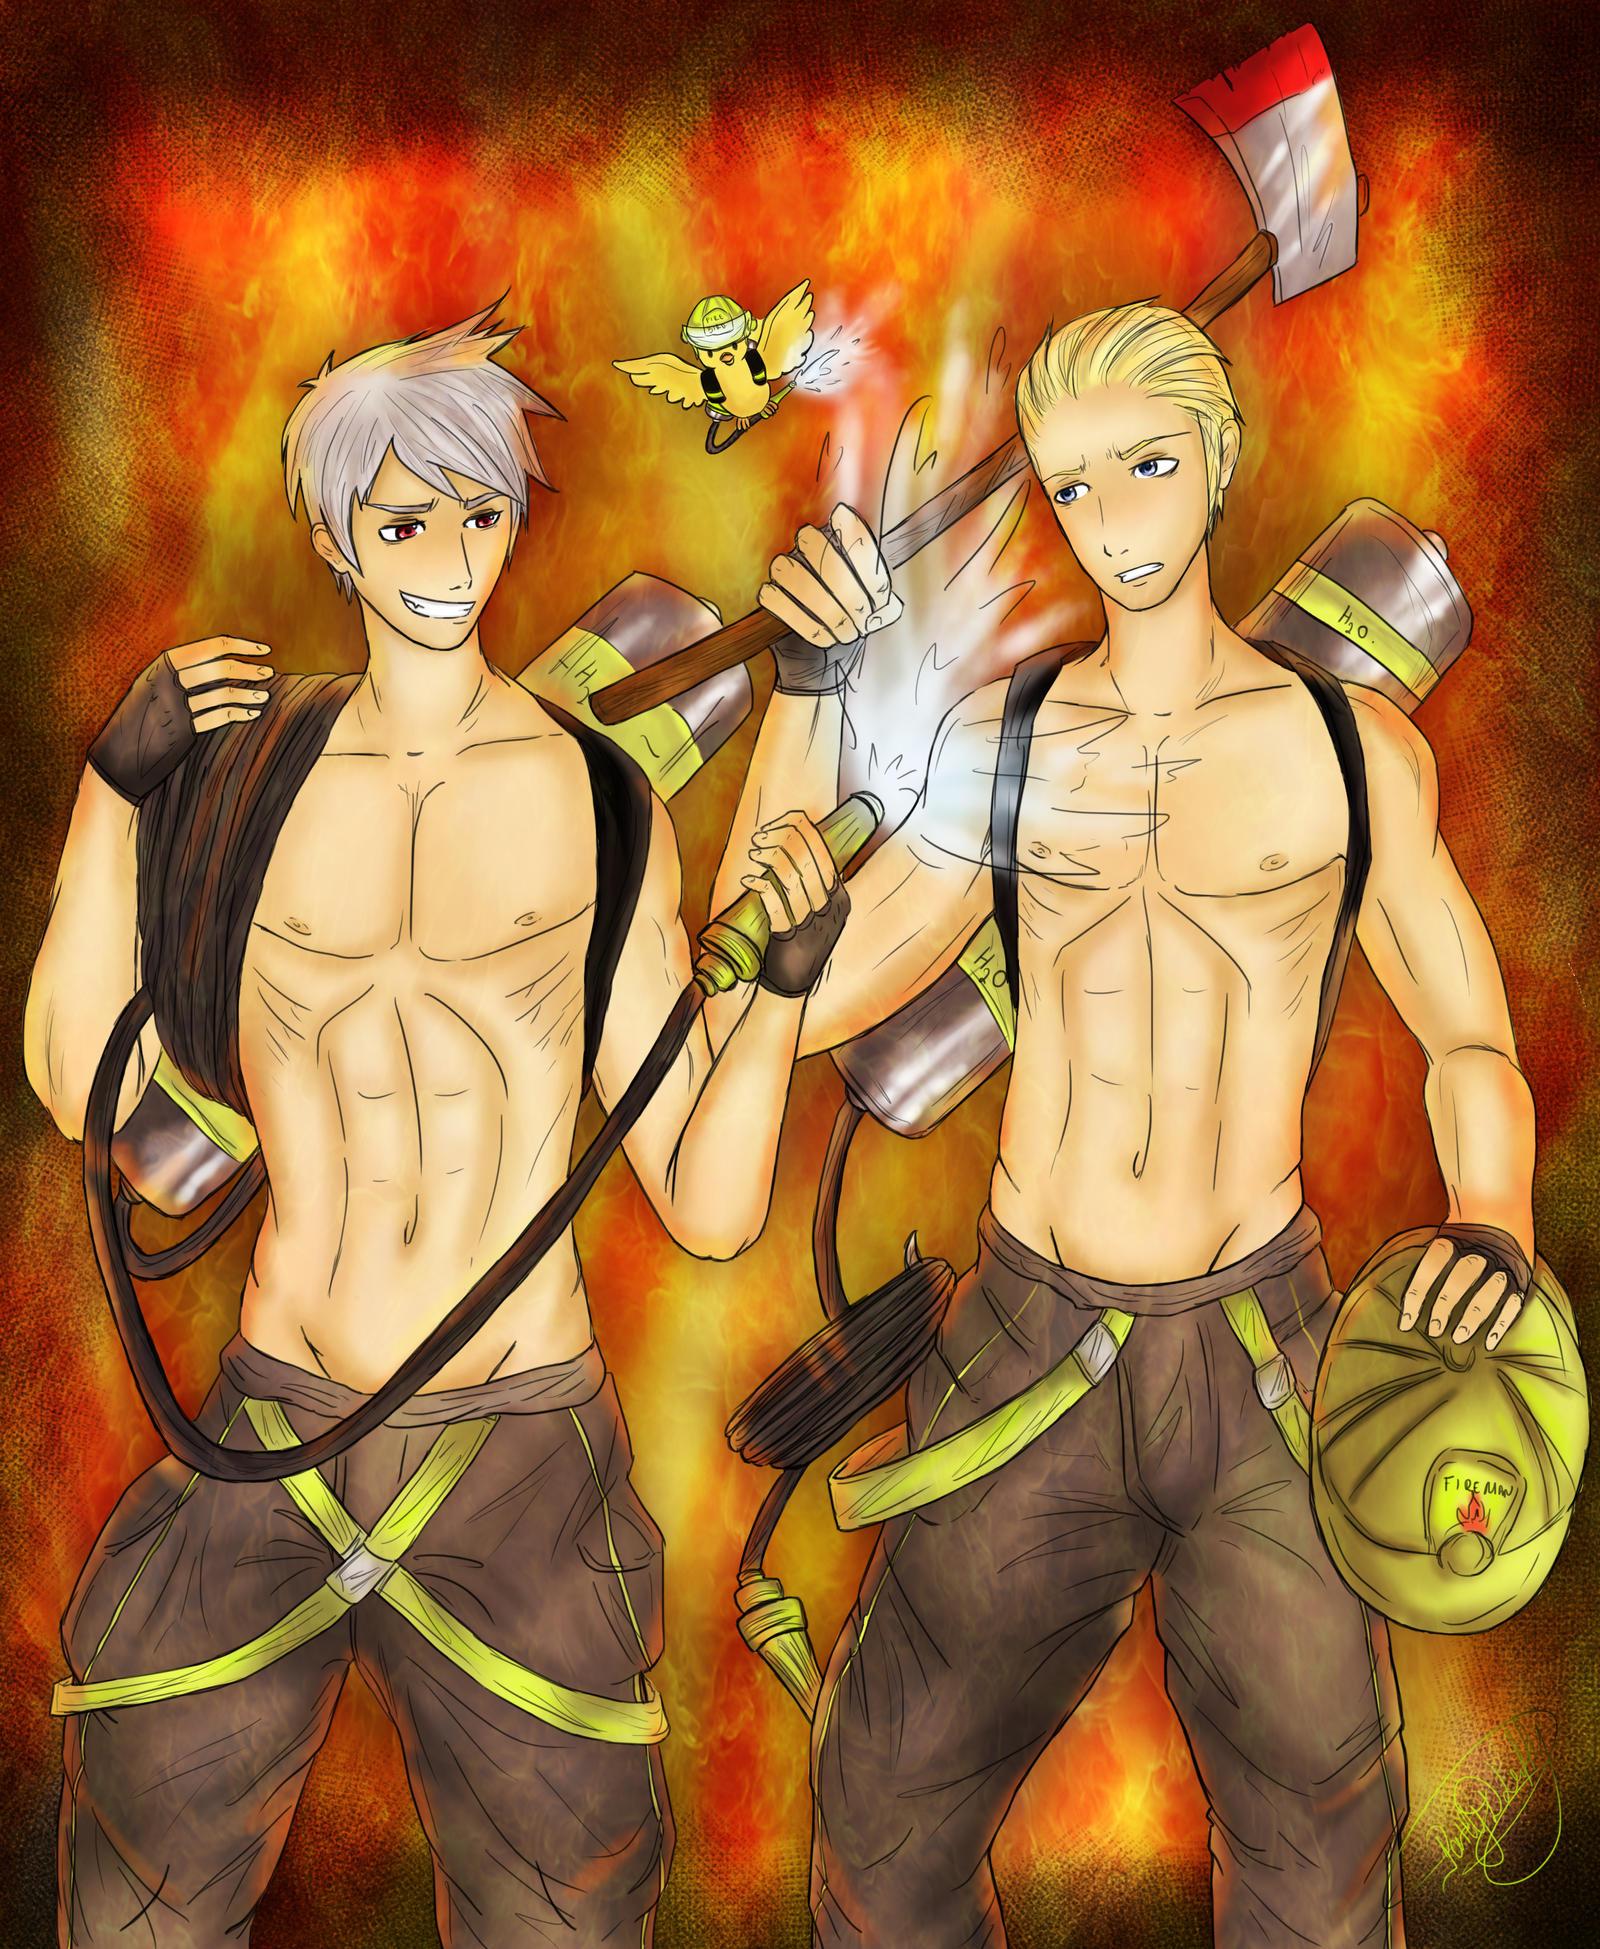 Firemen German Bros - I am on Fire!! by patty110692